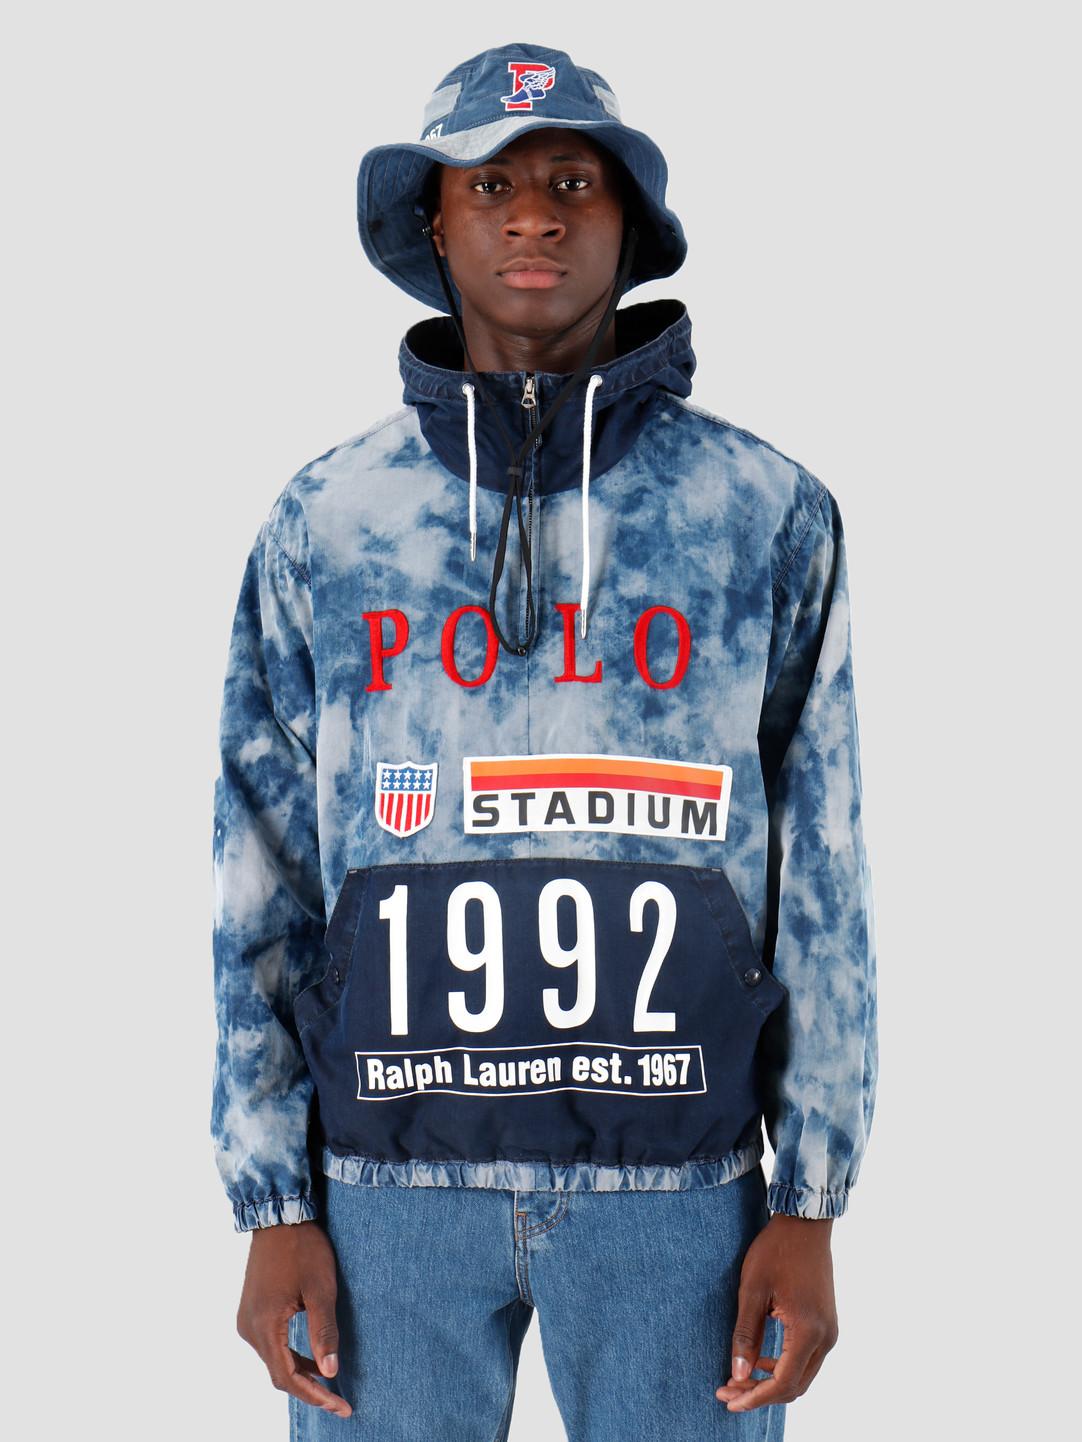 Polo Ralph Lauren Polo Ralph Lauren Popover Jkt Denim Jacket Wyattson 710752844001